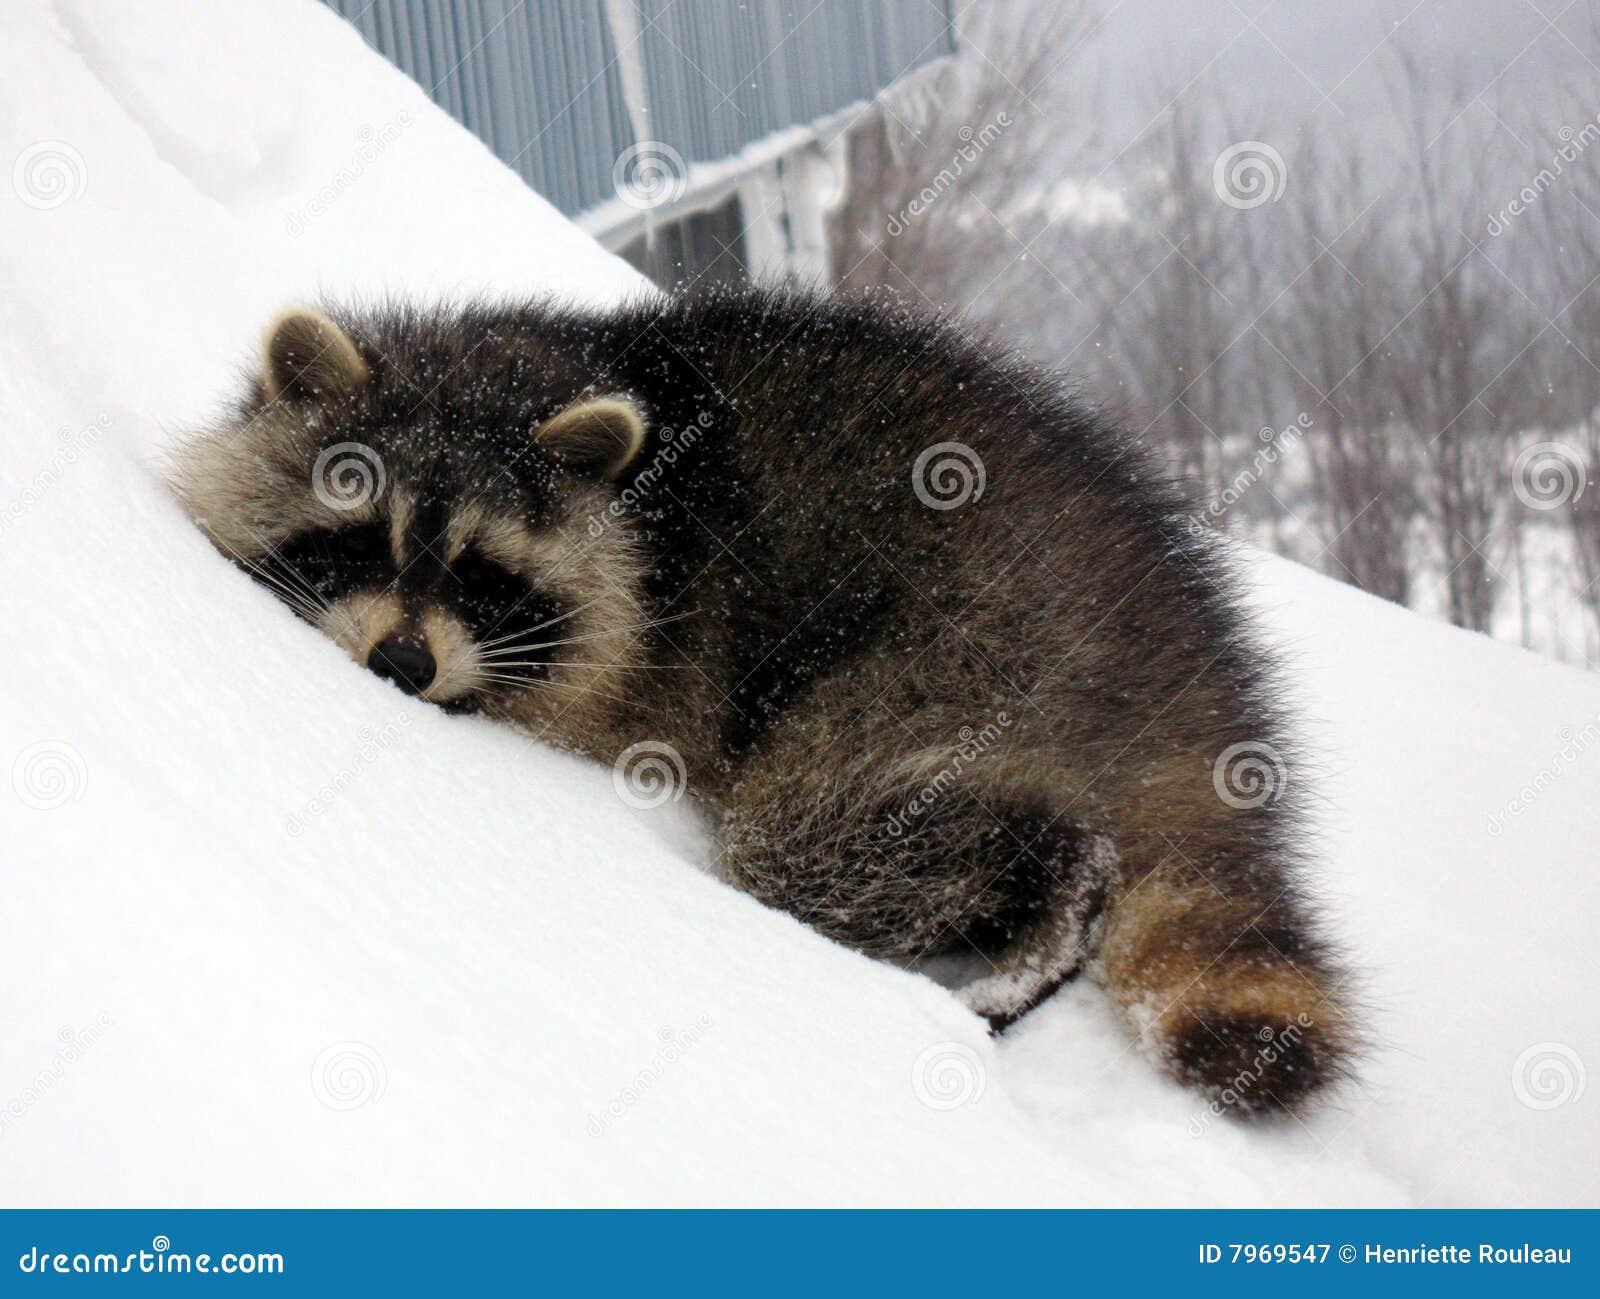 Sleeping Raccoon On Snow Royalty Free Stock Photography